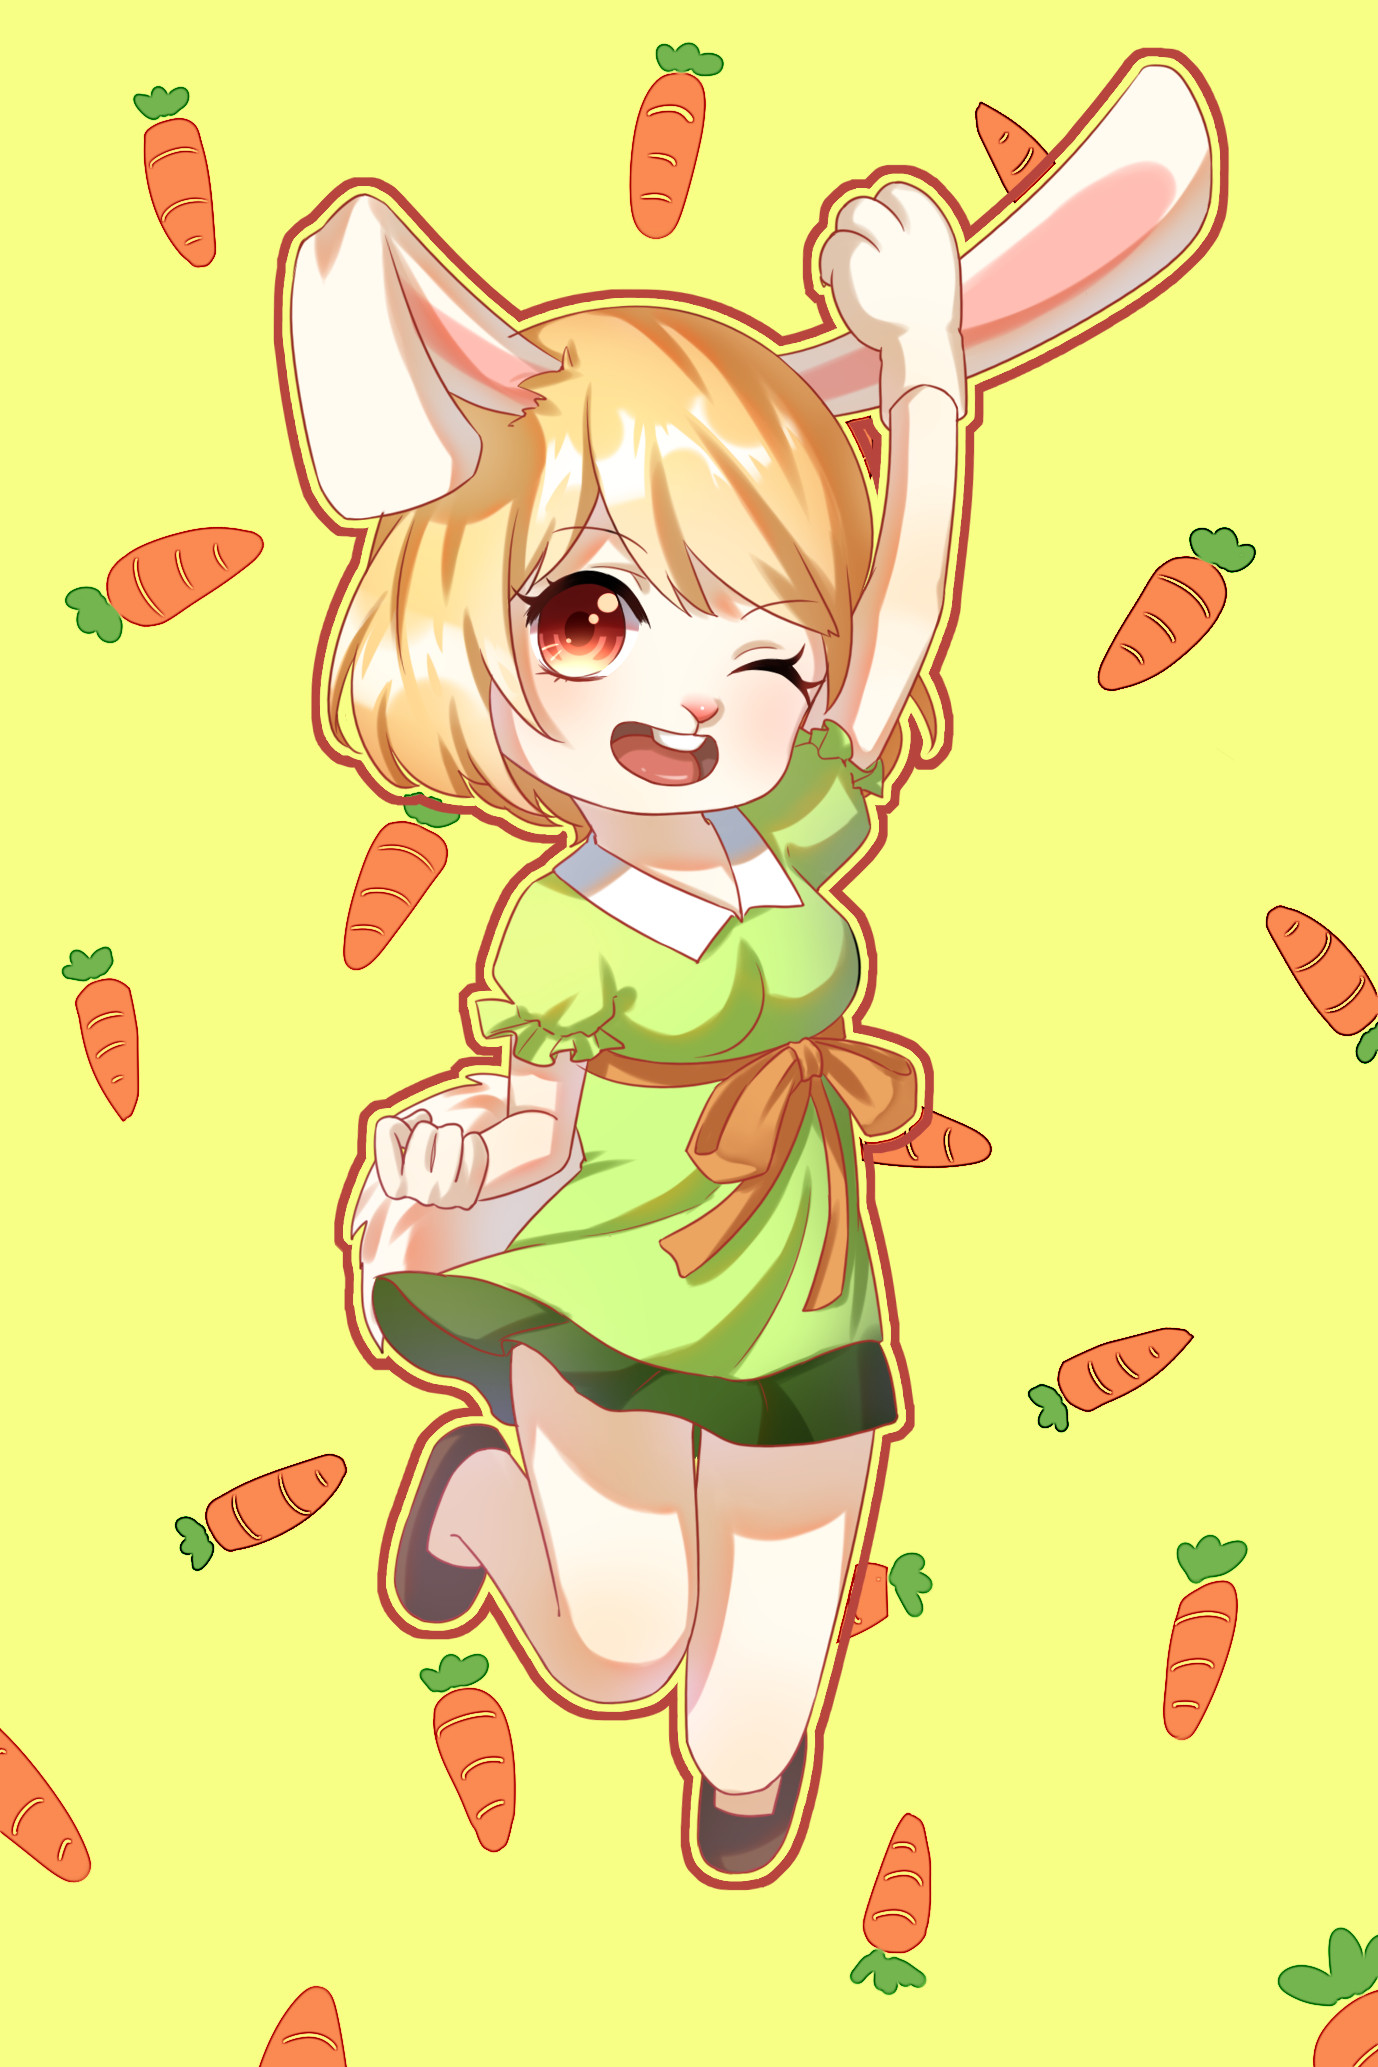 Carrot One Piece Hentai  Carrot ONE PIECE Zerochan Anime Image Board